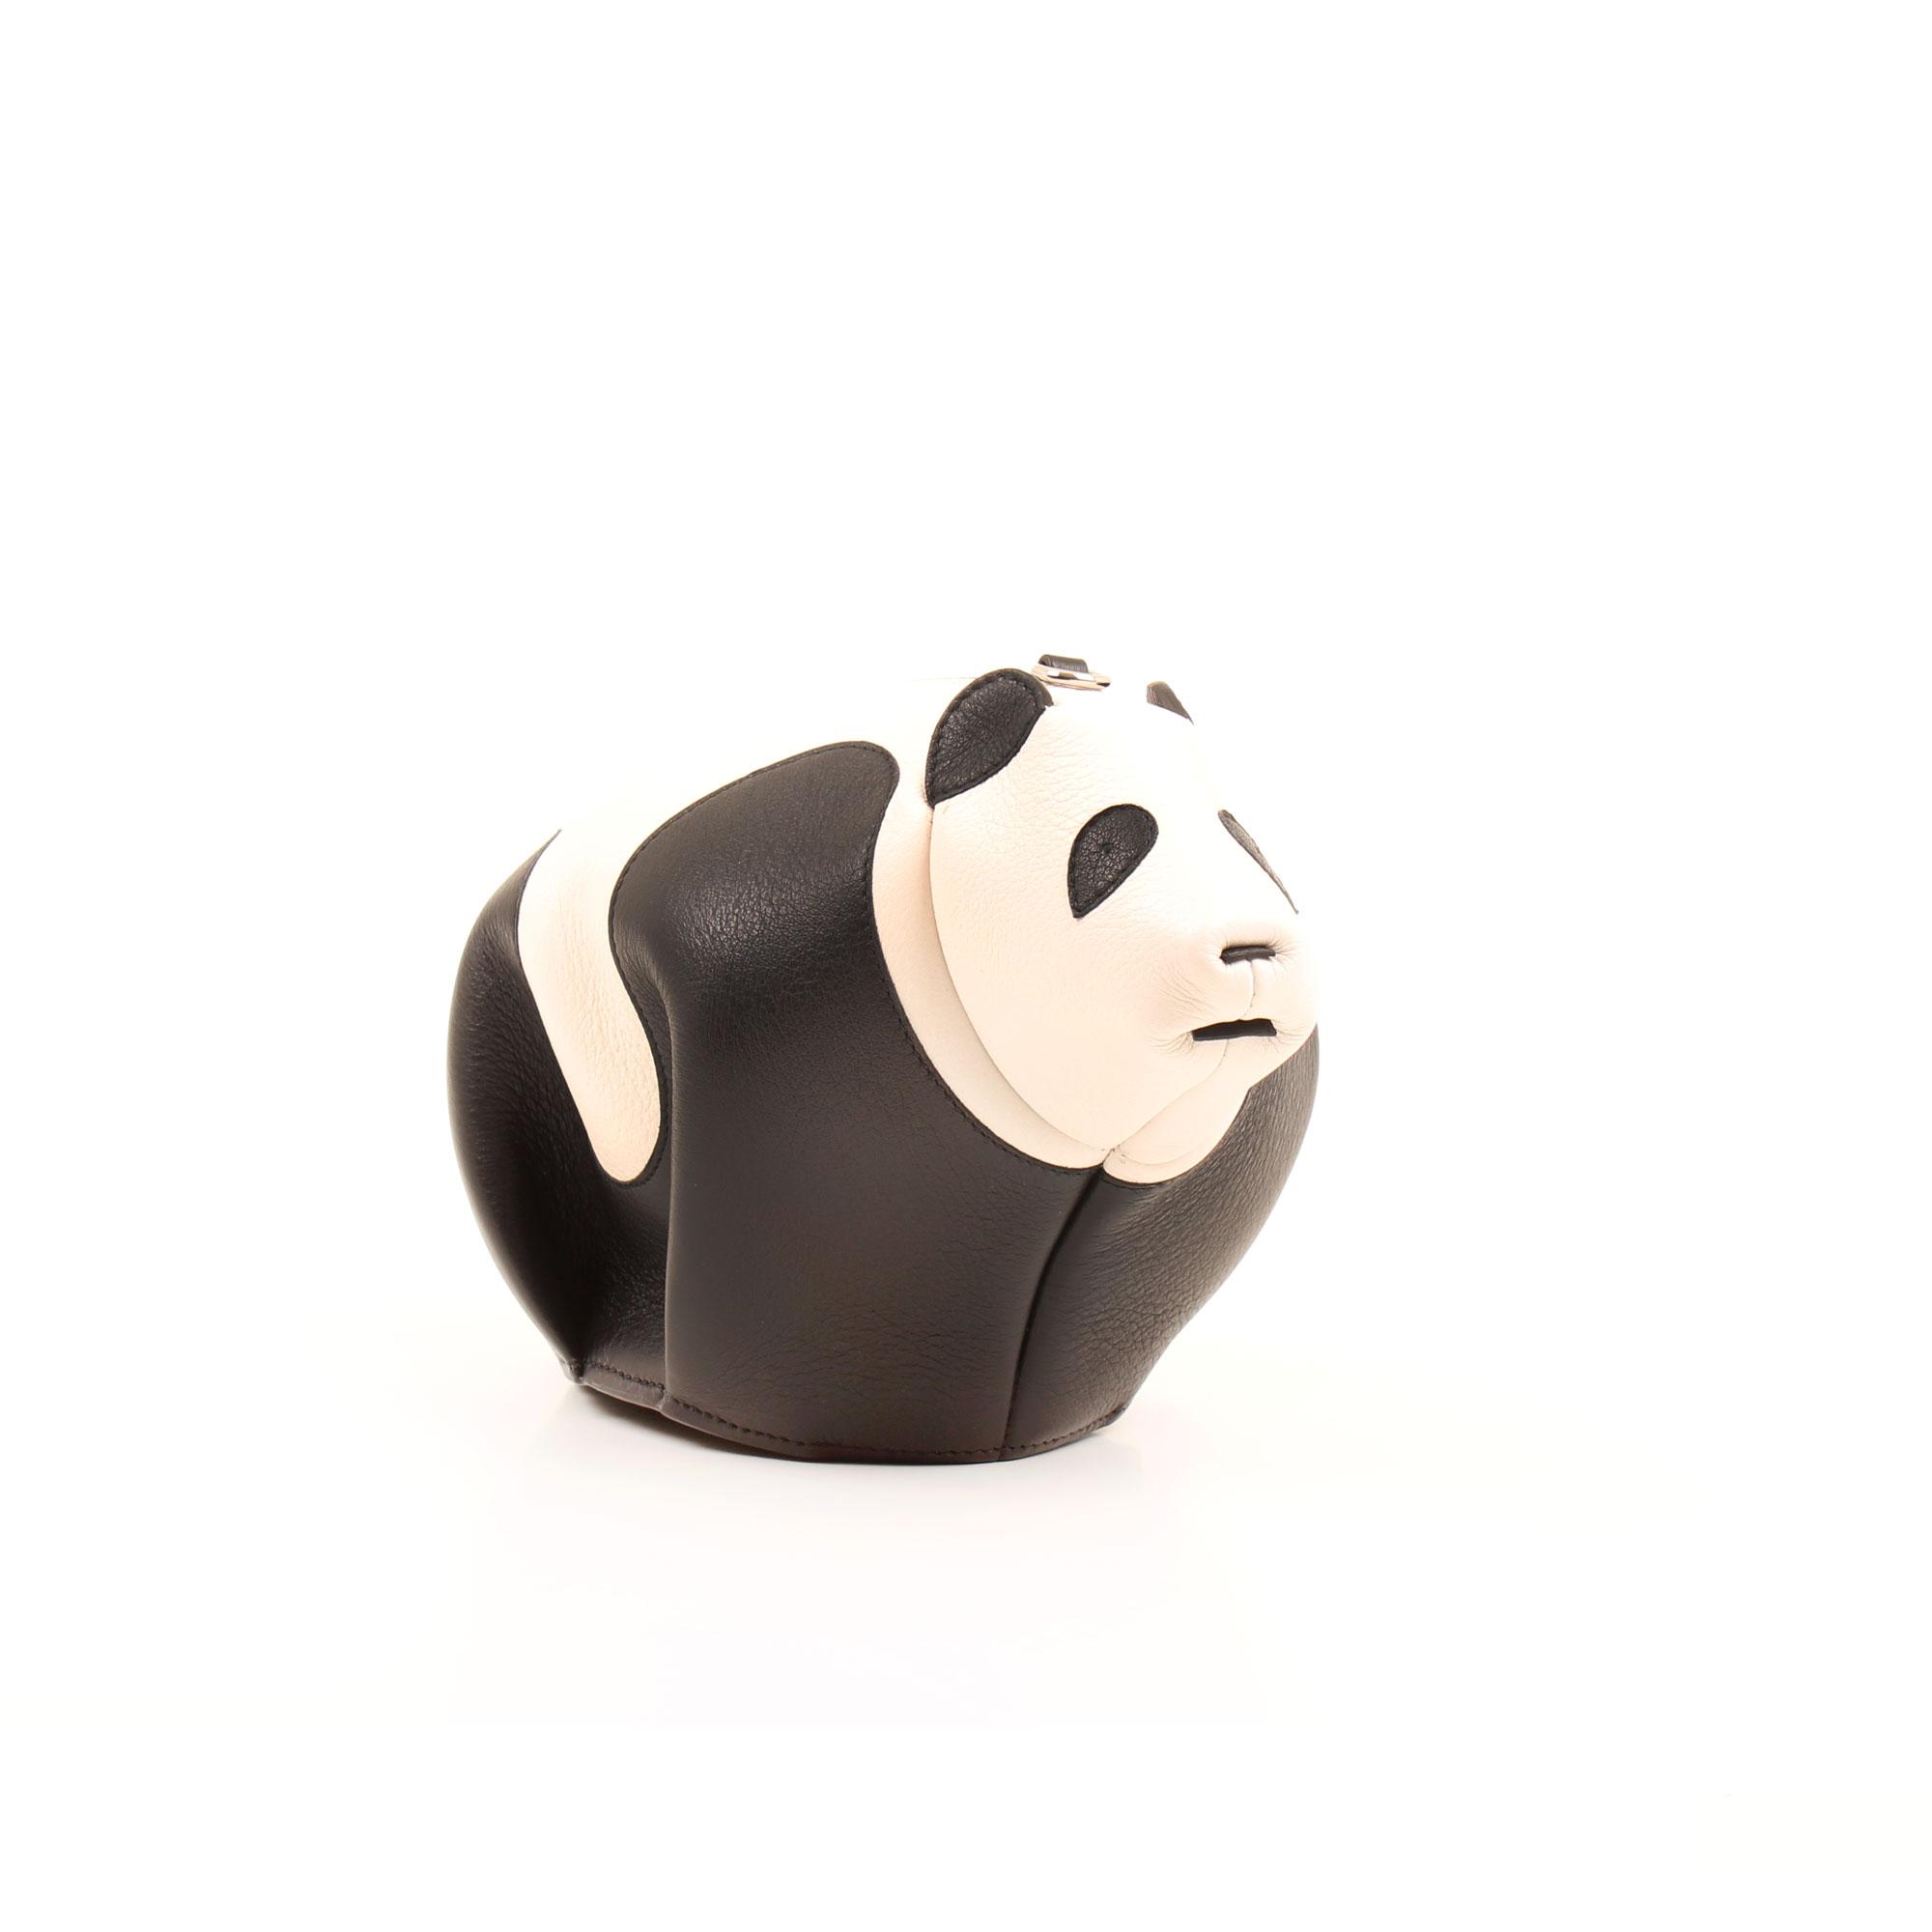 Imagen general del bolso loewe mini panda piel